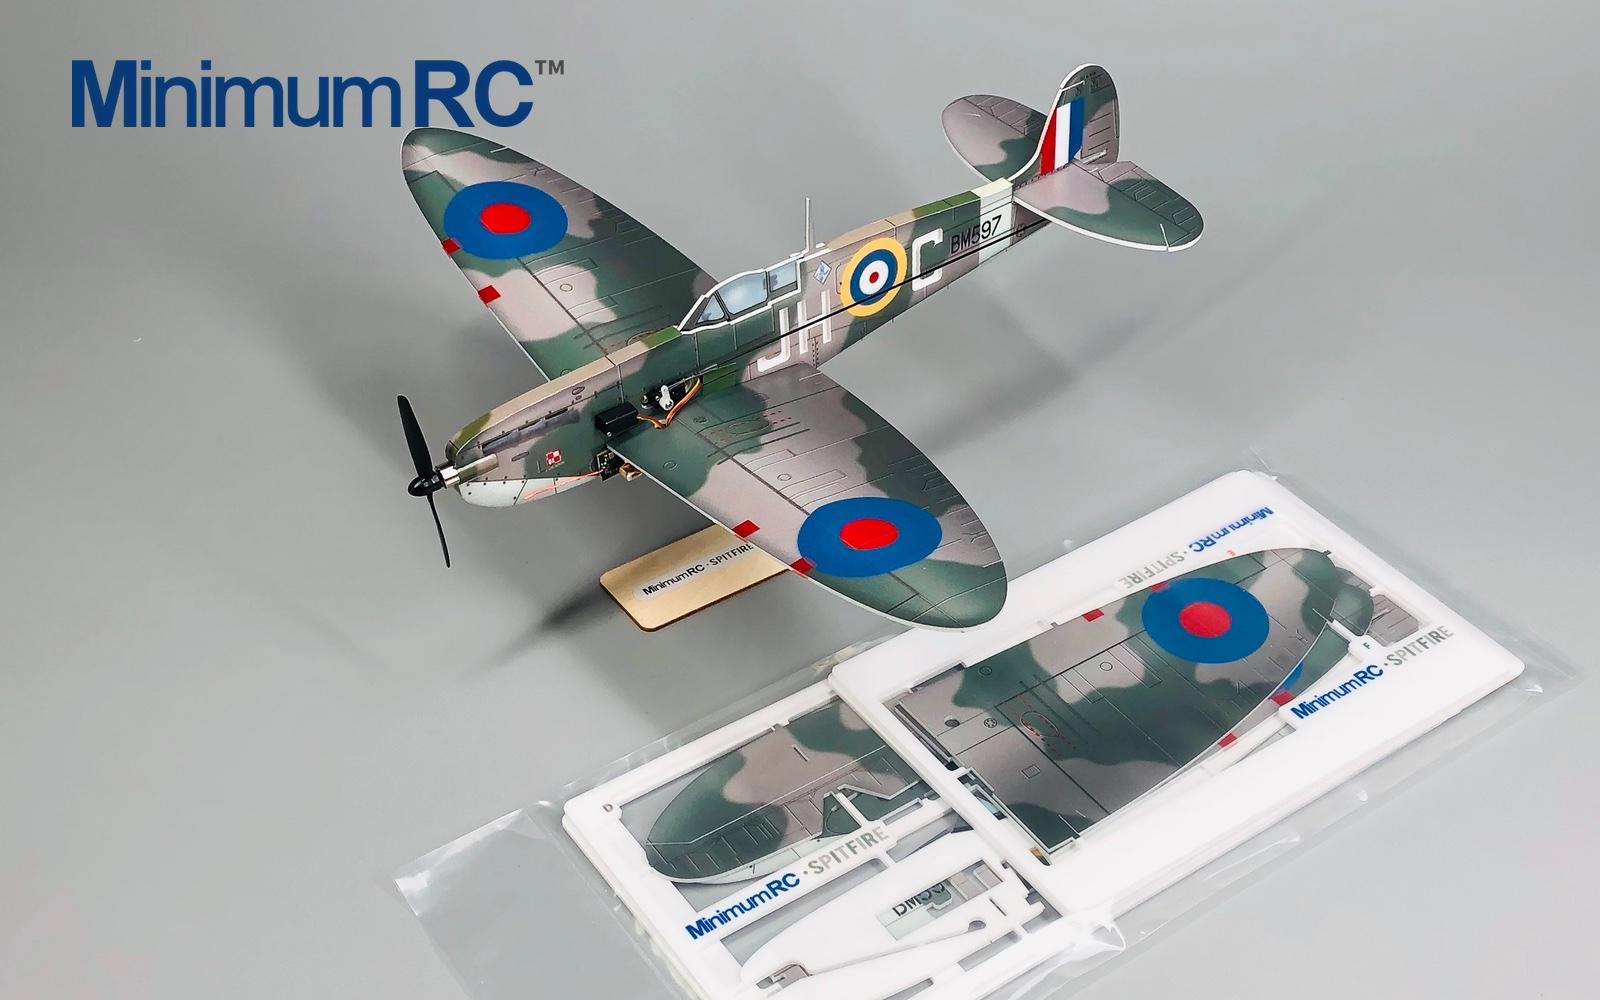 Spitfire MinimumRC